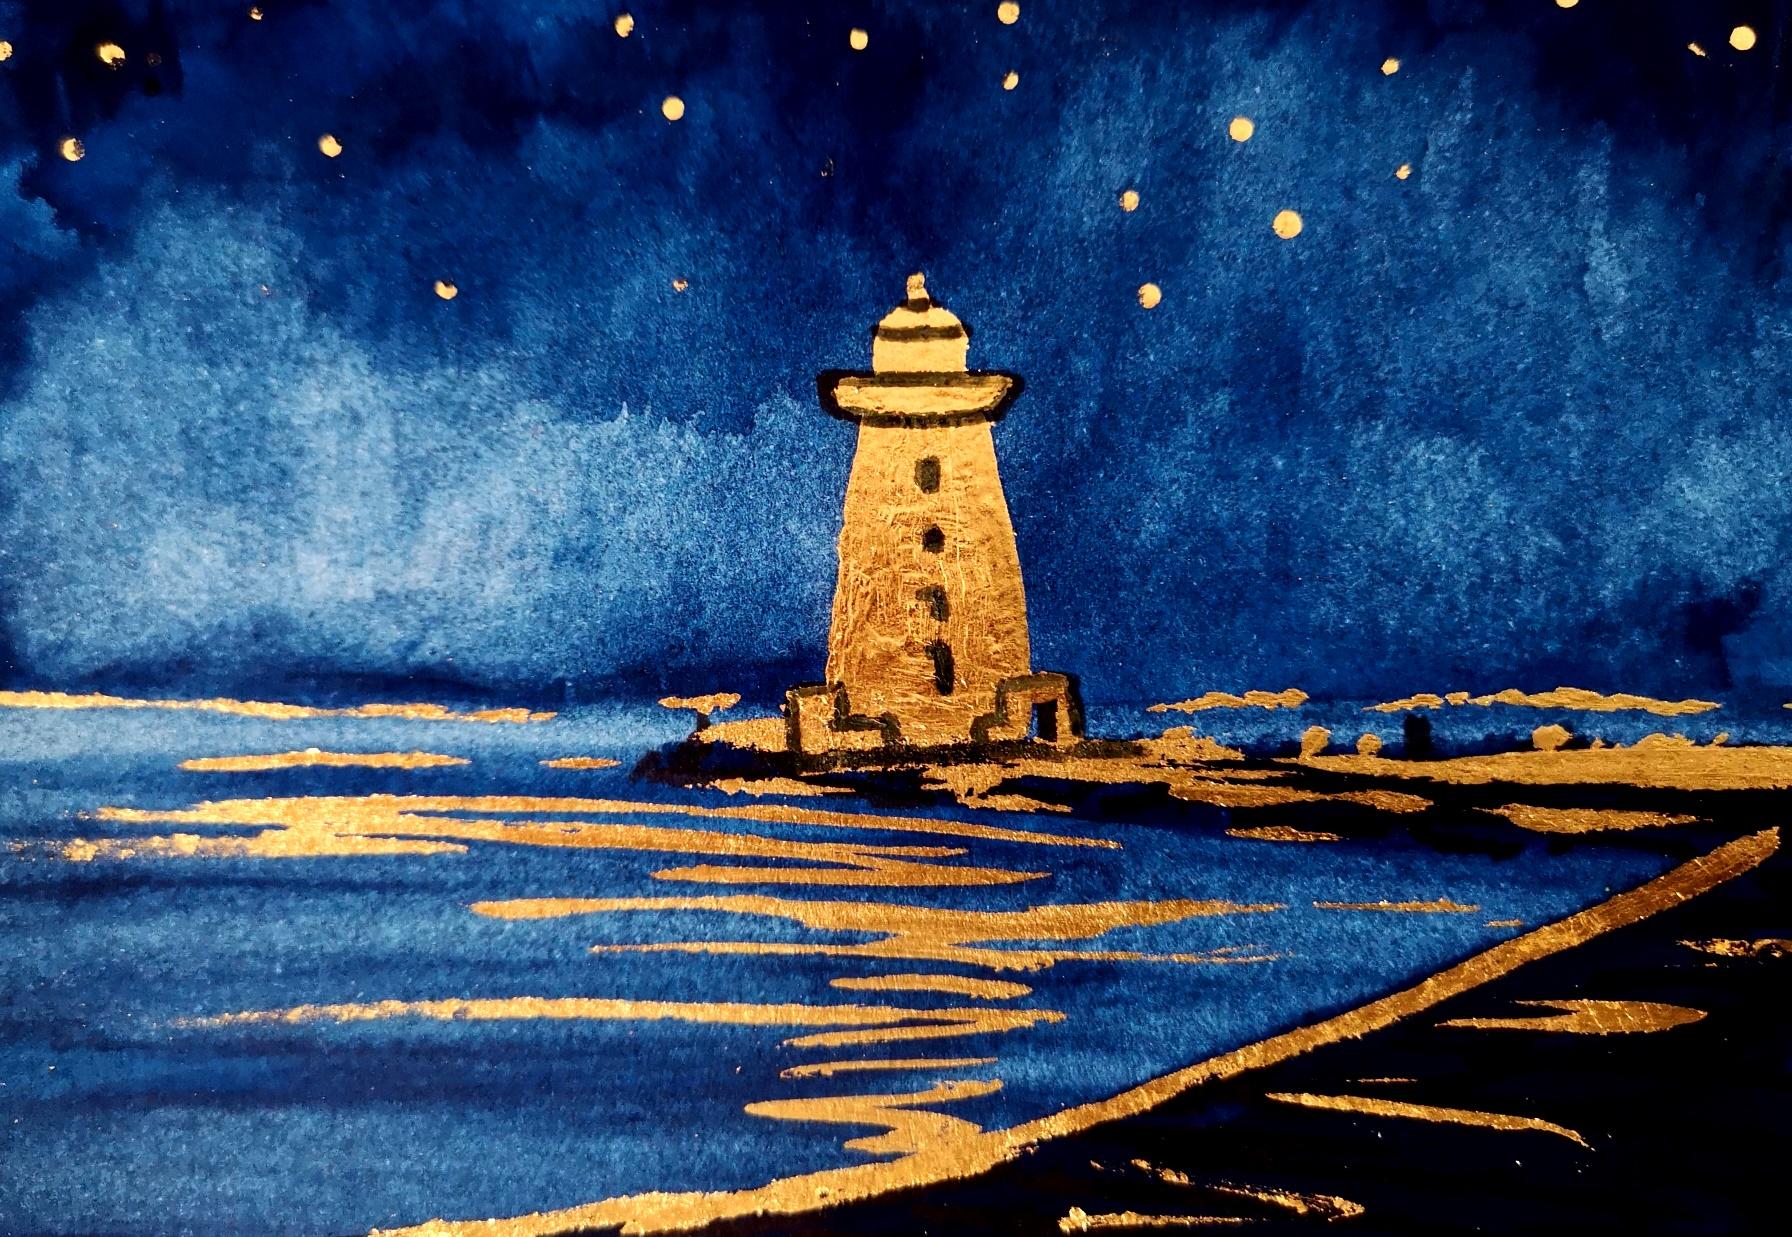 Poolbeg Lighthouse & Pier